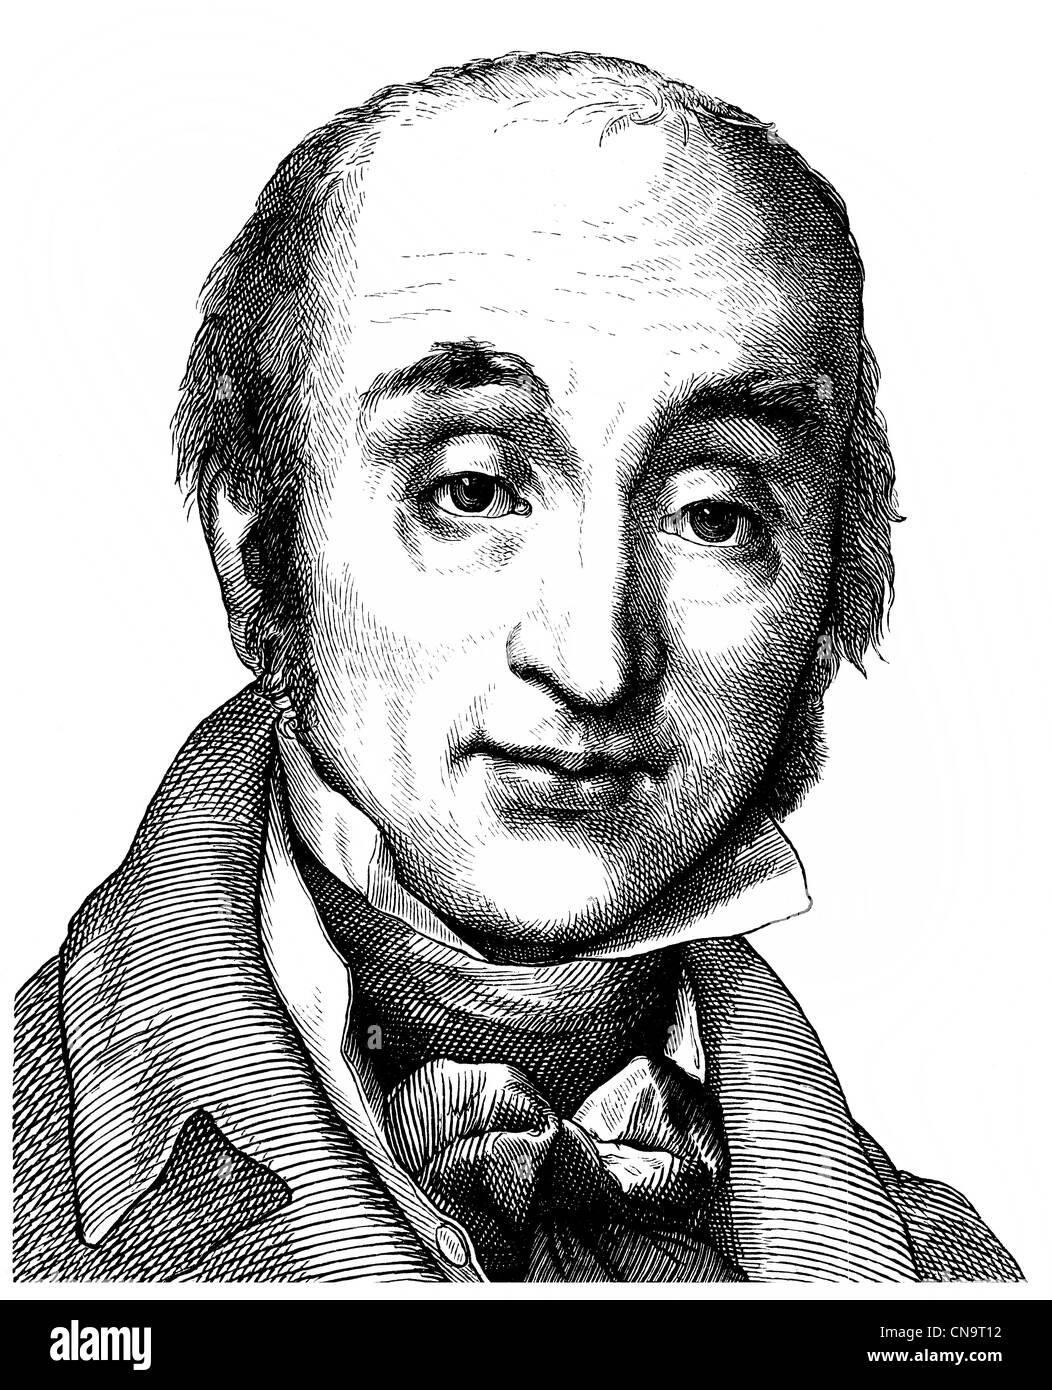 Historical drawing, Johann Gottlob Nathusius, 1760 - 1835, a German businessman, entrepreneur and landowner Stock Photo